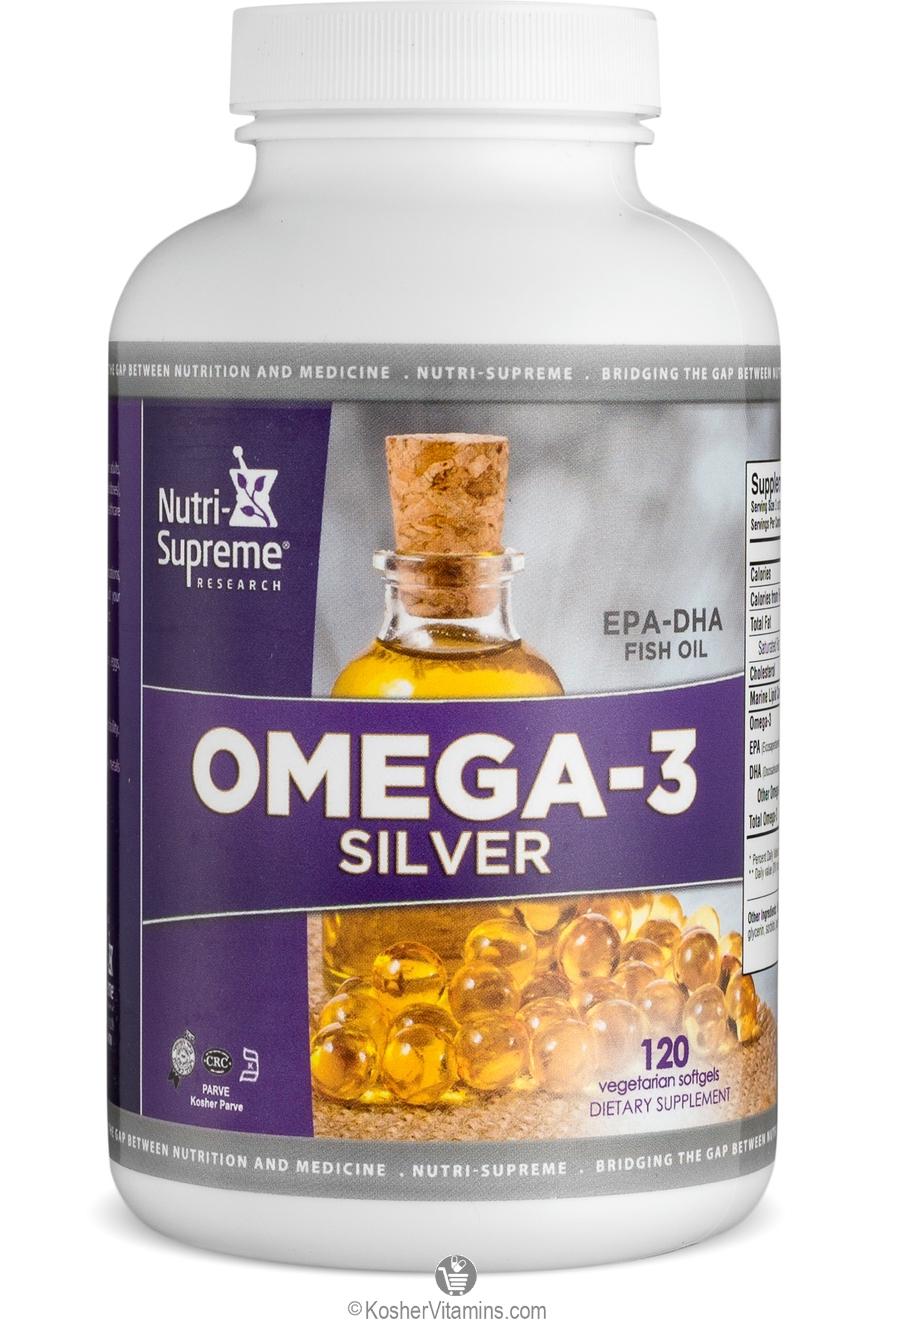 Nutri supreme research kosher omega 3 silver fish oil epa for Kosher fish oil